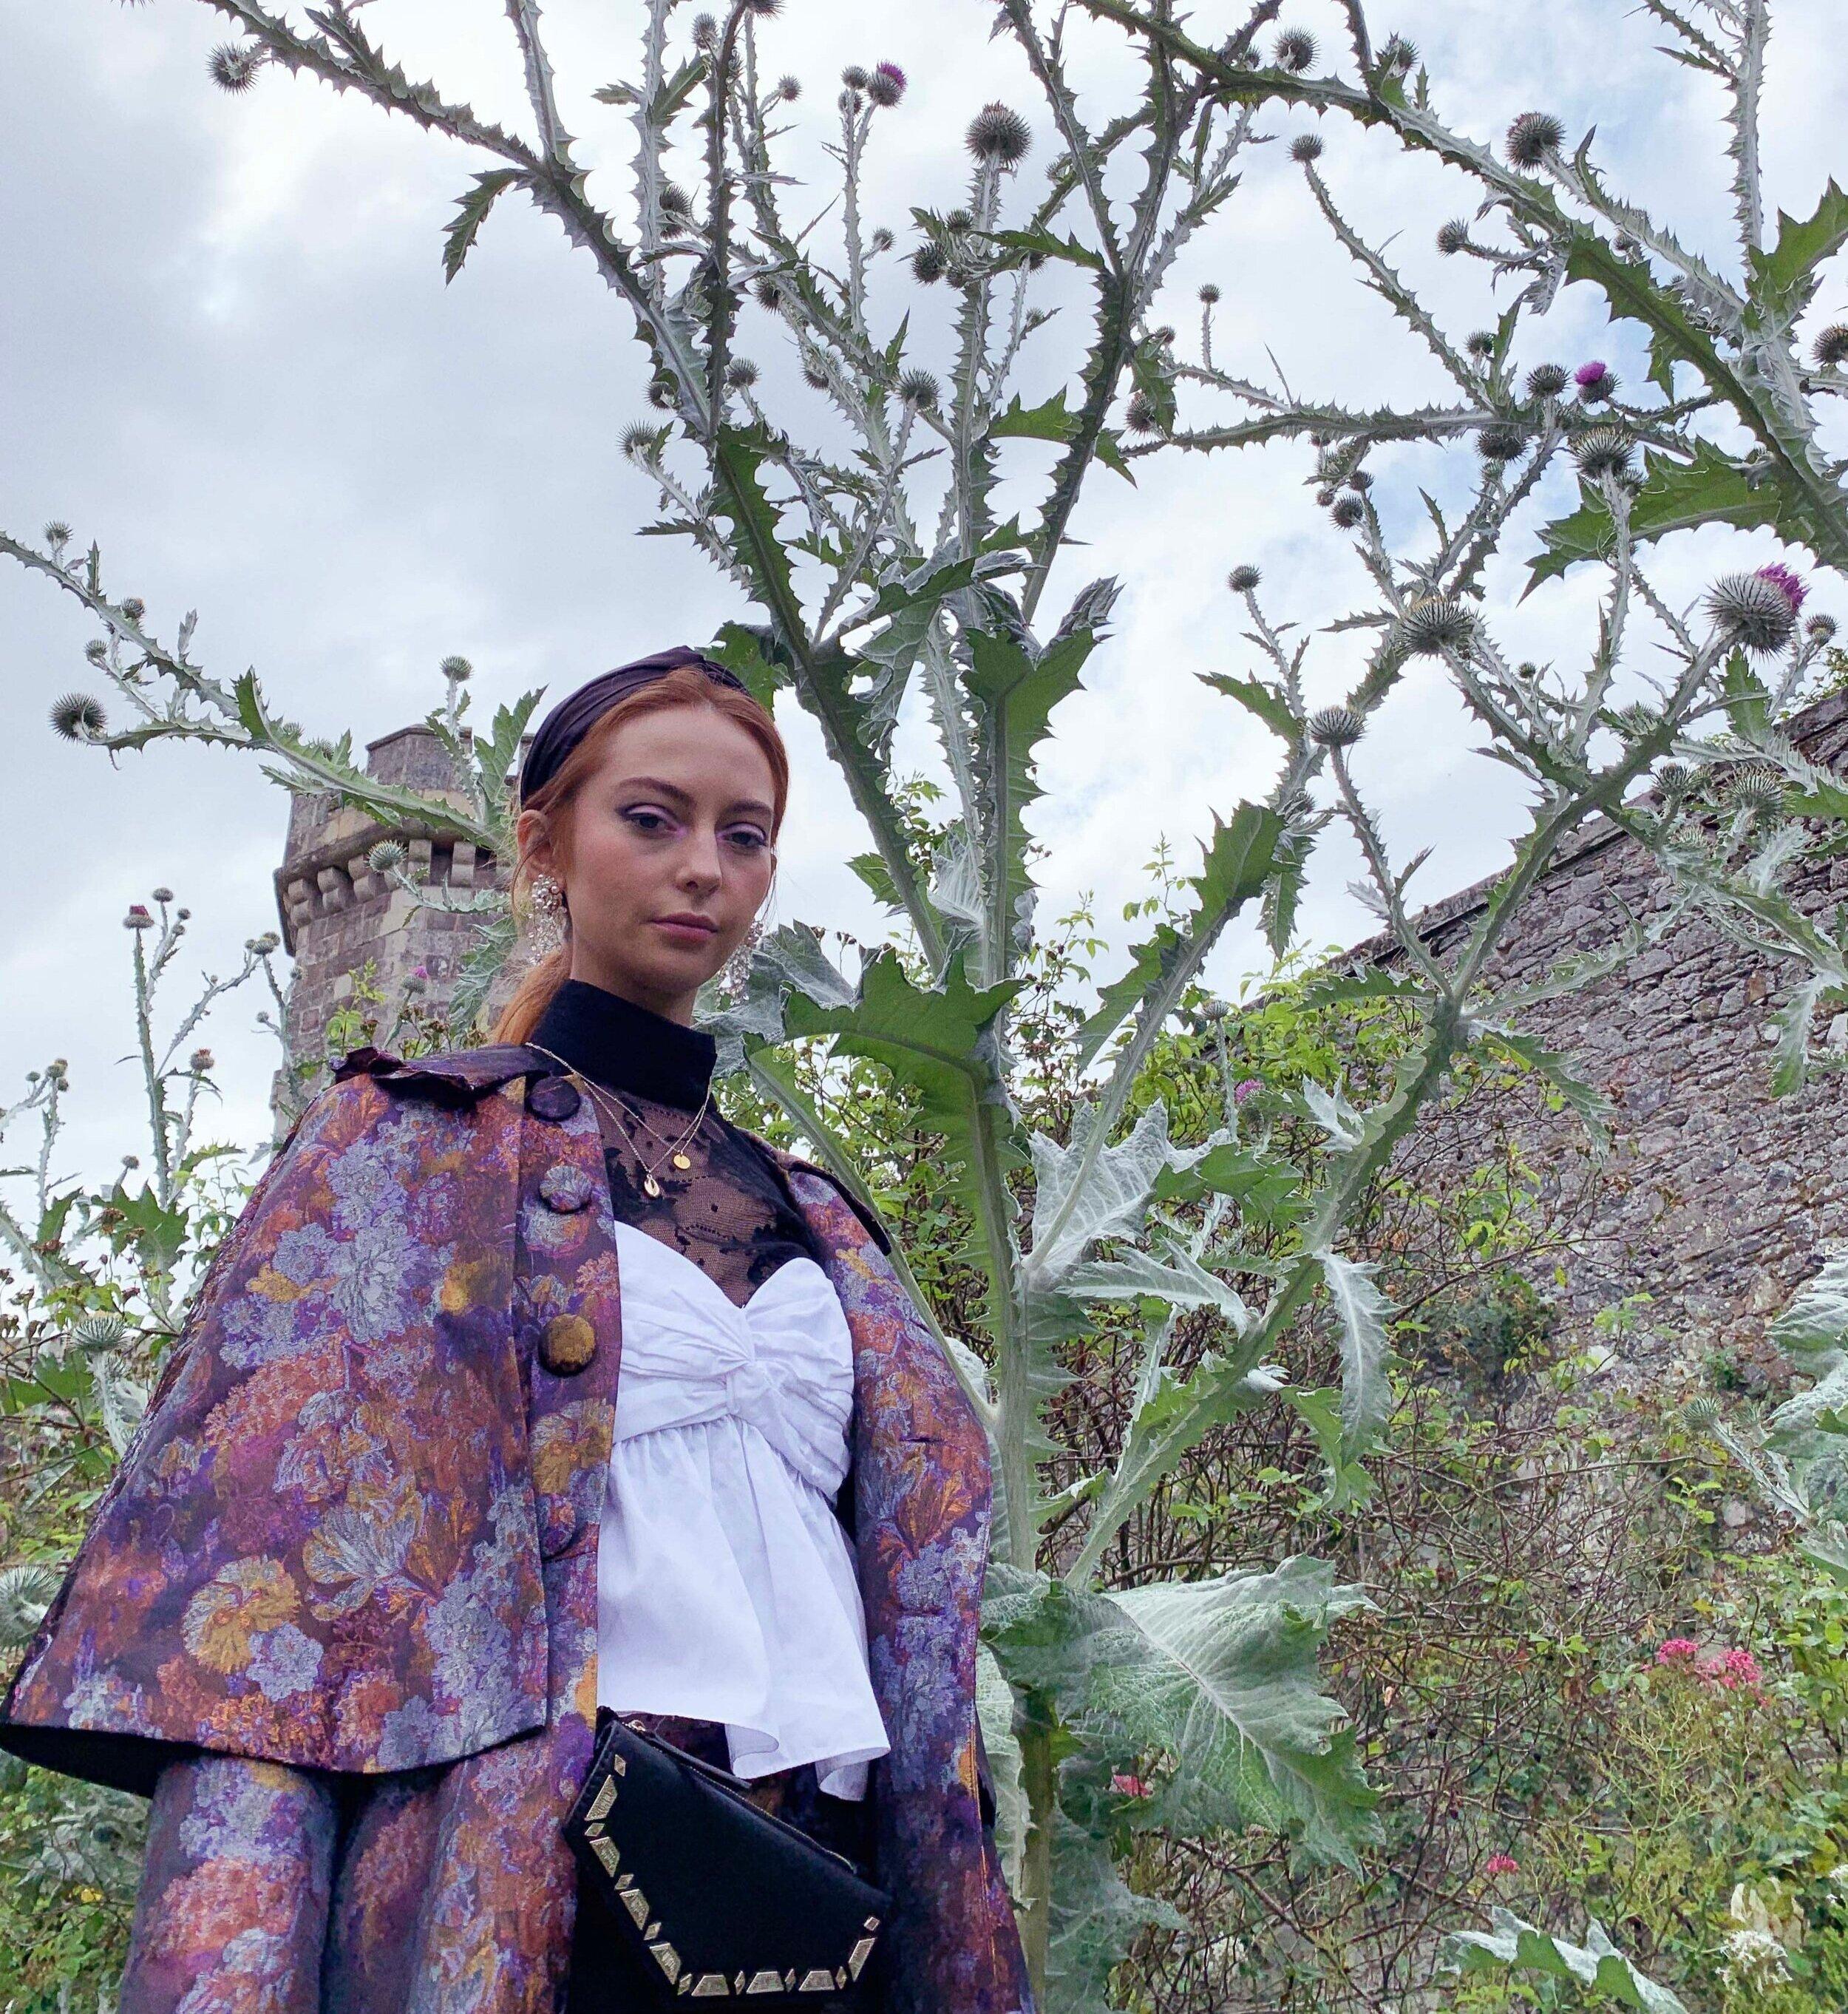 Logan in Scotland wearing the Witchery Coat in Brocade